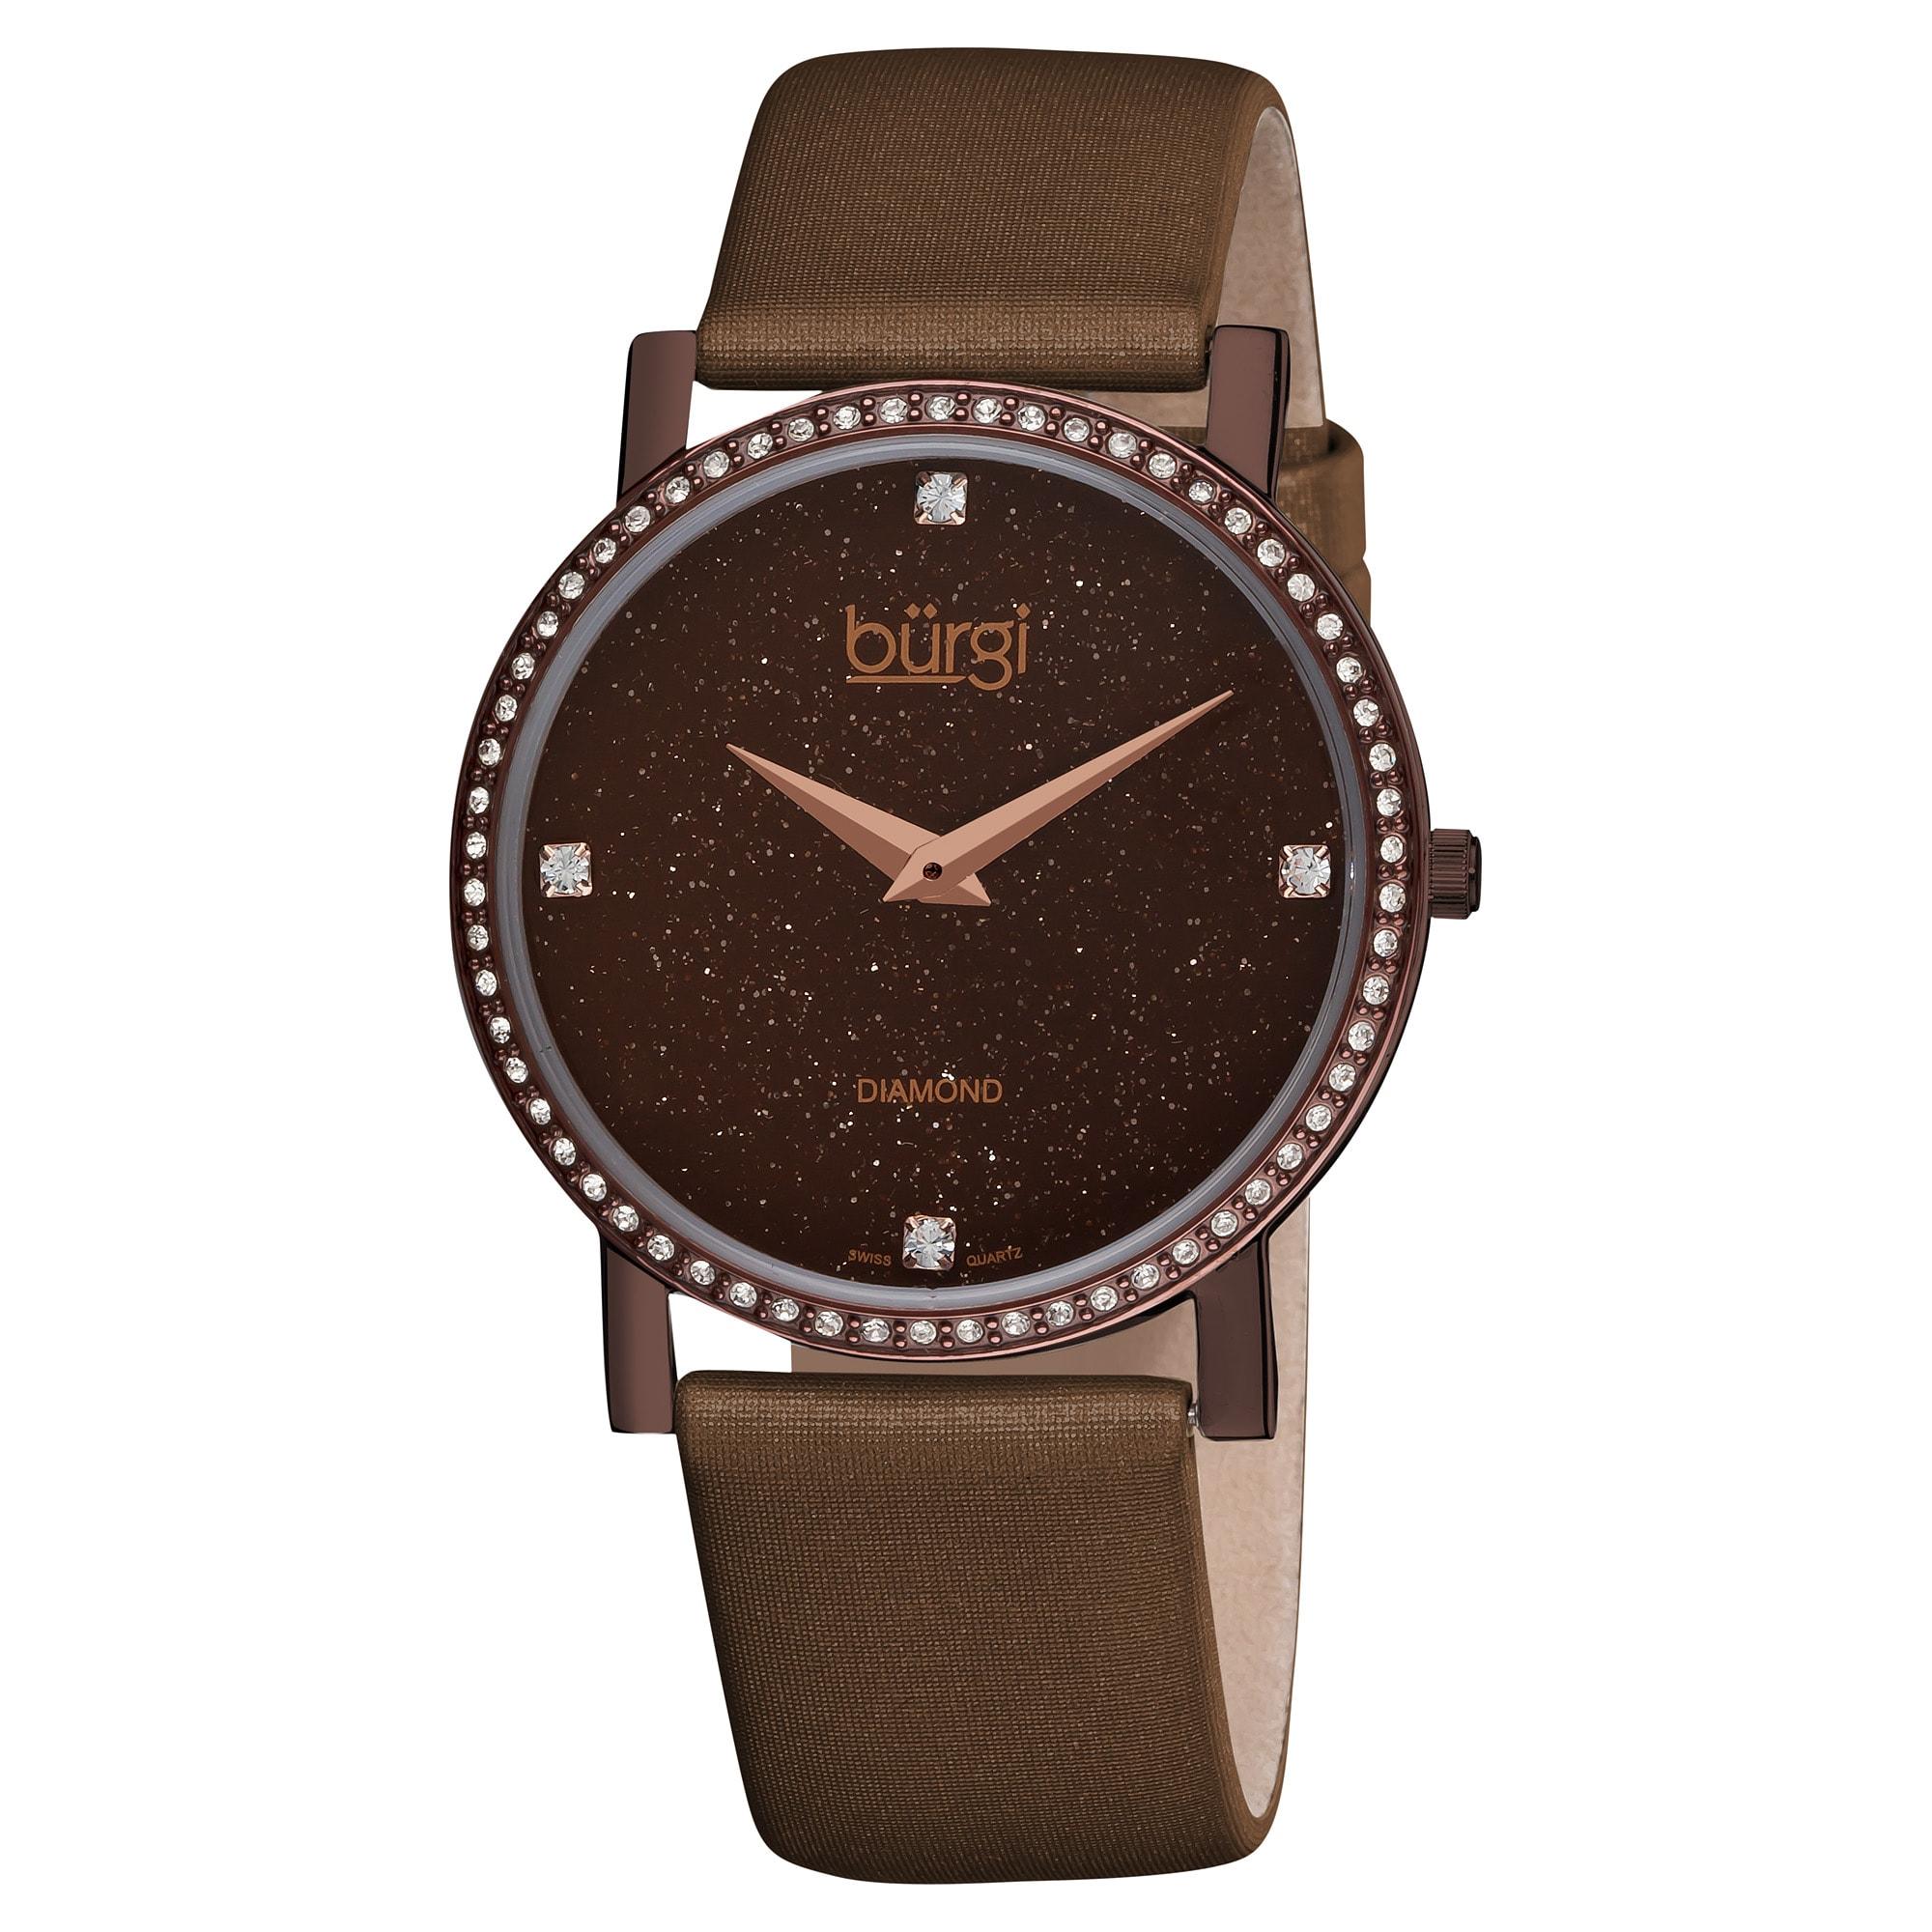 Burgi Women's Brown-dial Swiss Quartz Diamond Satin-strap Watch